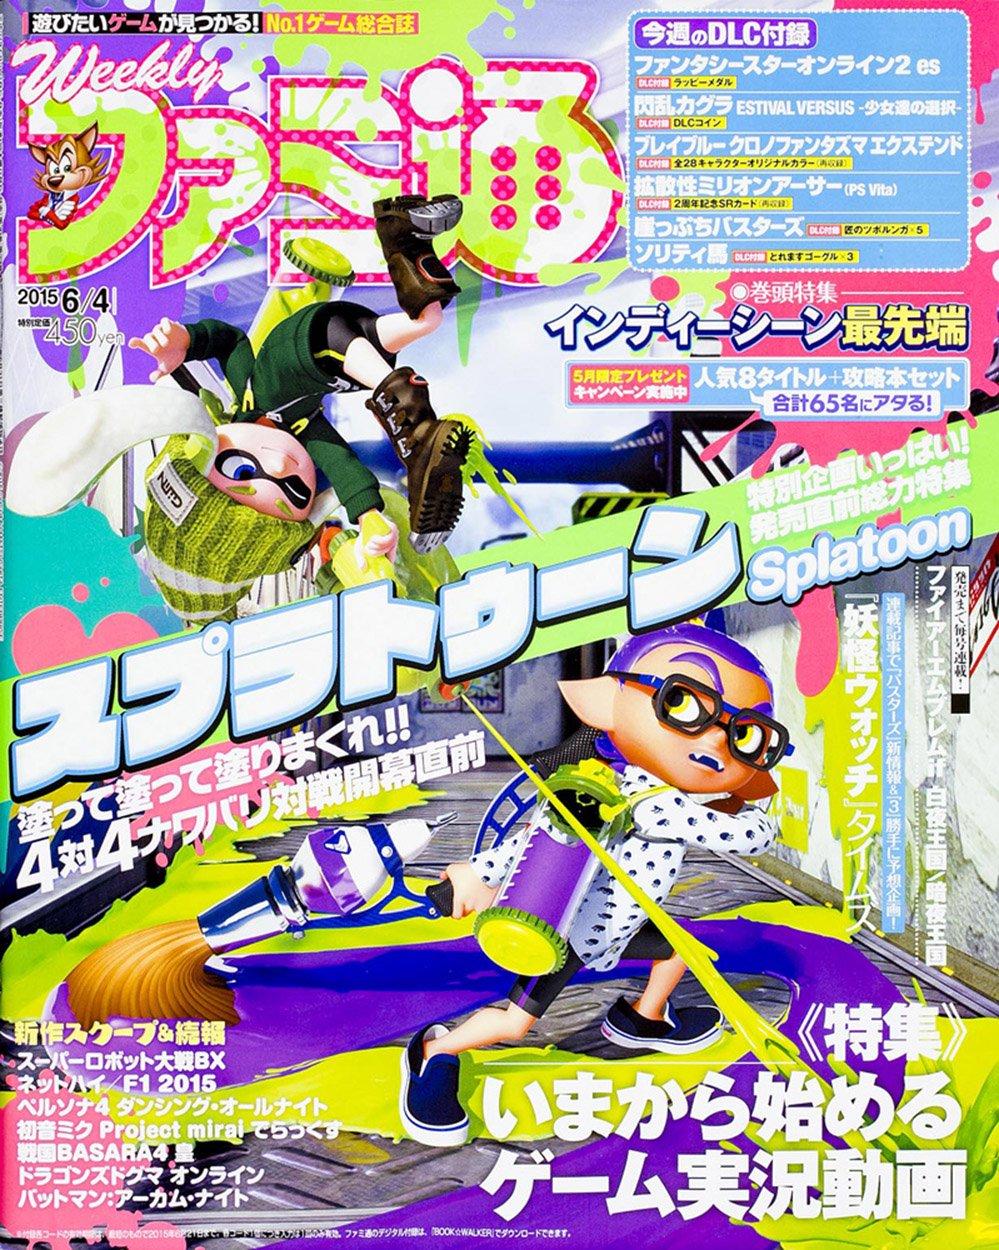 Famitsu 1381 June 4, 2015